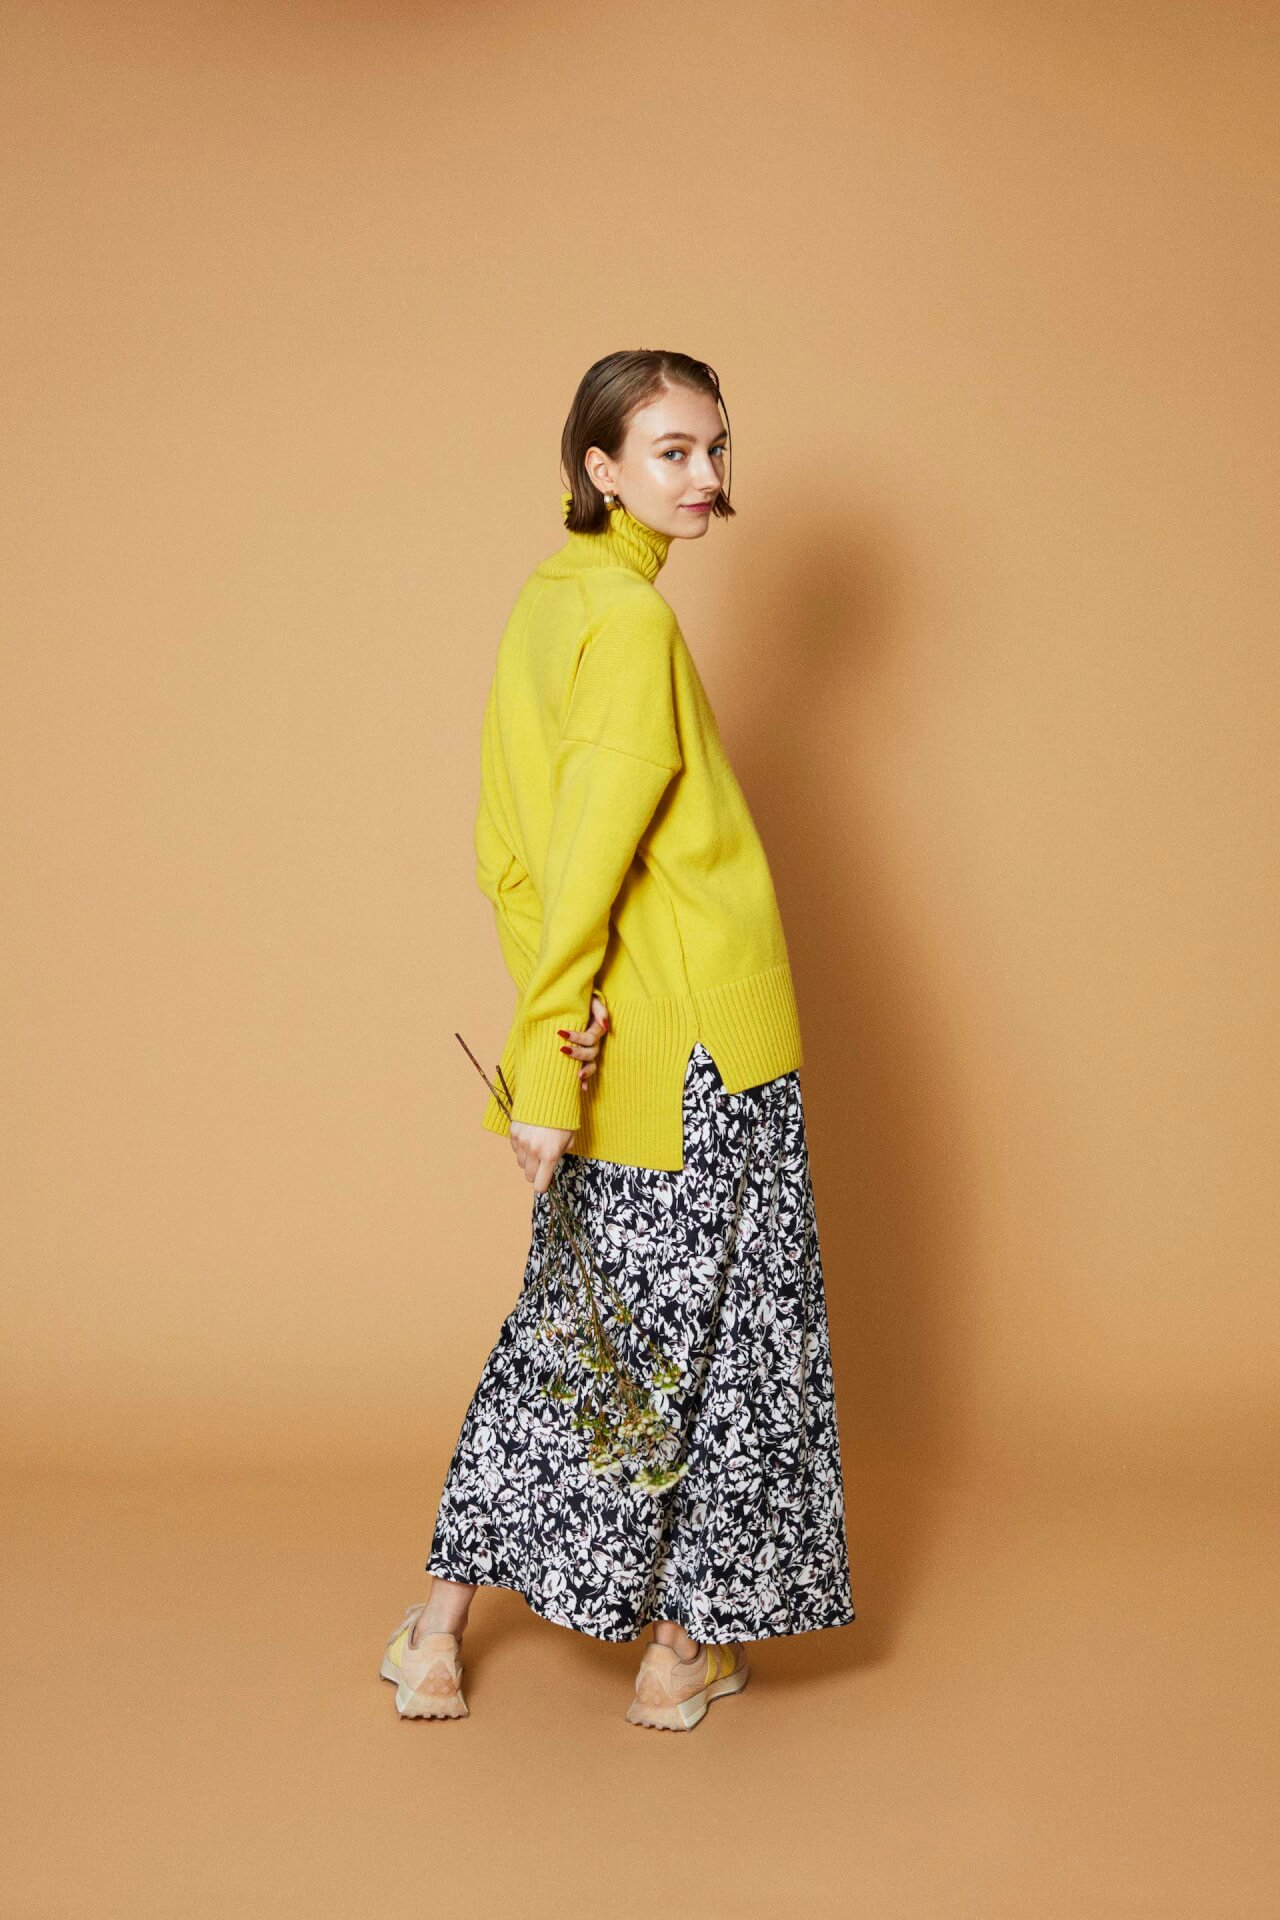 New Balanceの人気モデル「327」からemmi、to/oneとのトリプルコラボレーションモデルが登場!限定店舗で販売 fashion211008_newbalance-04